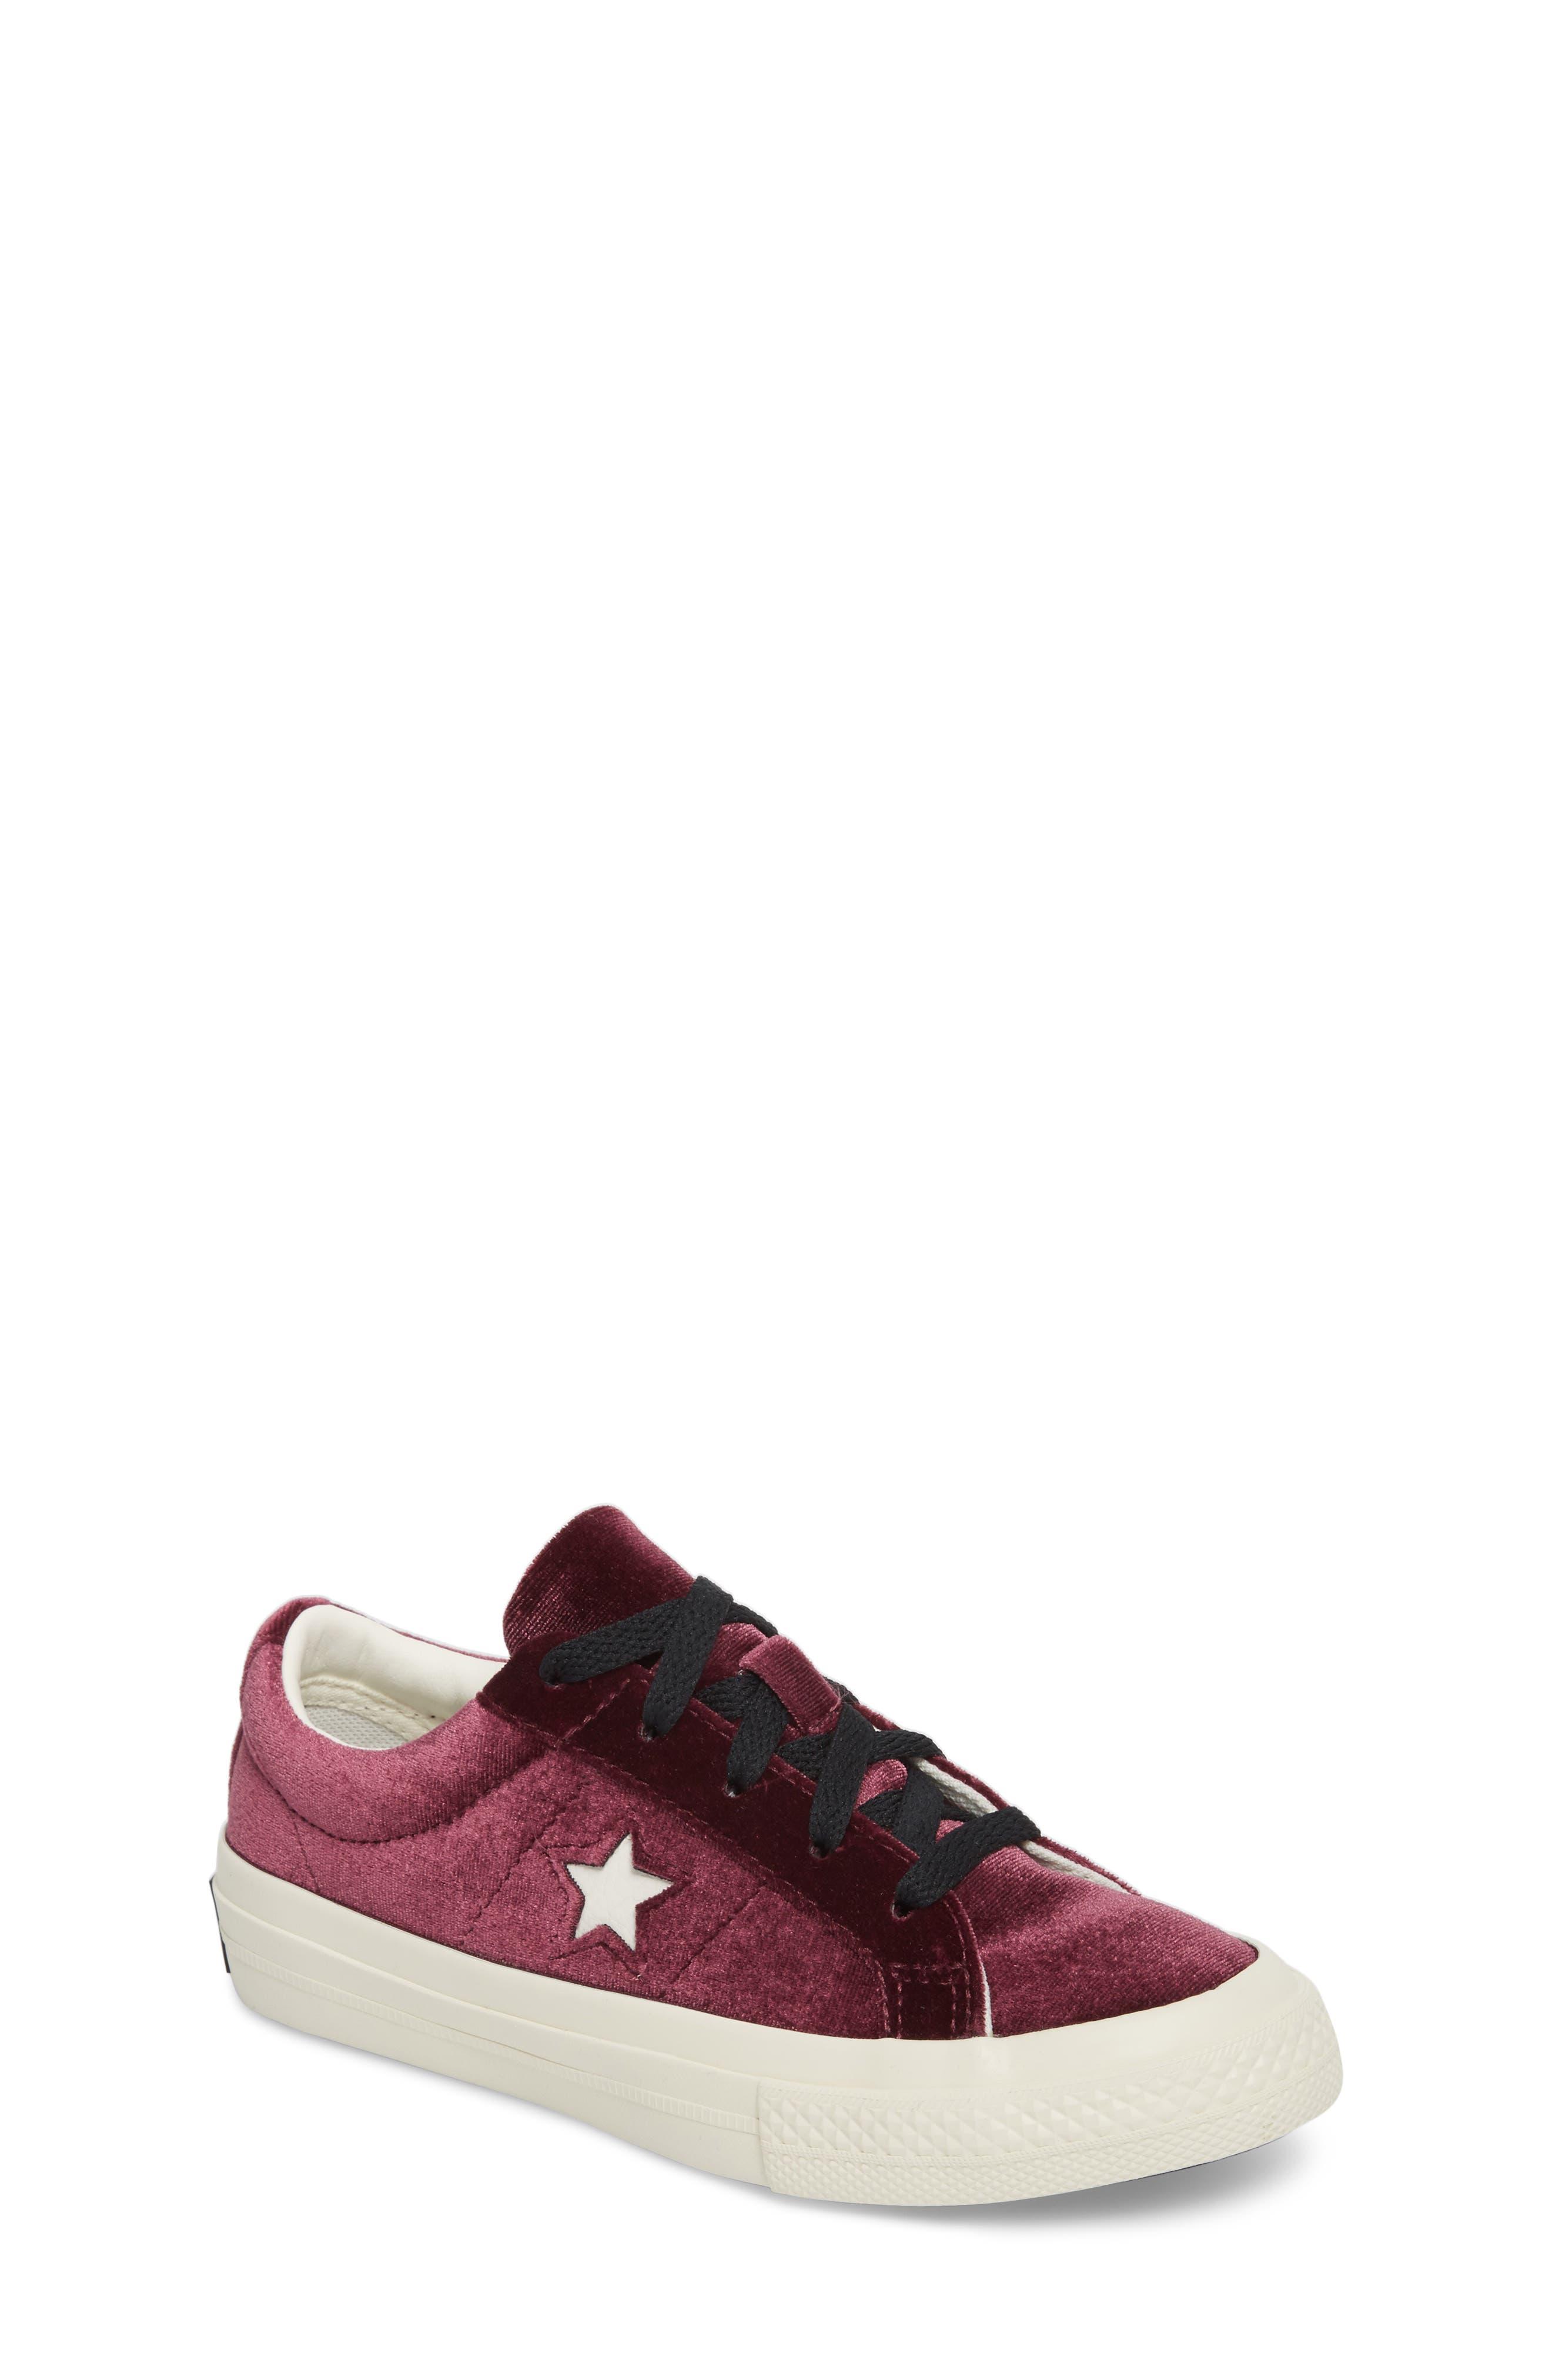 Main Image - Converse Chuck Taylor® All Star® One Star Velvet Platform Sneaker (Toddler, Little Kid & Big Kid)